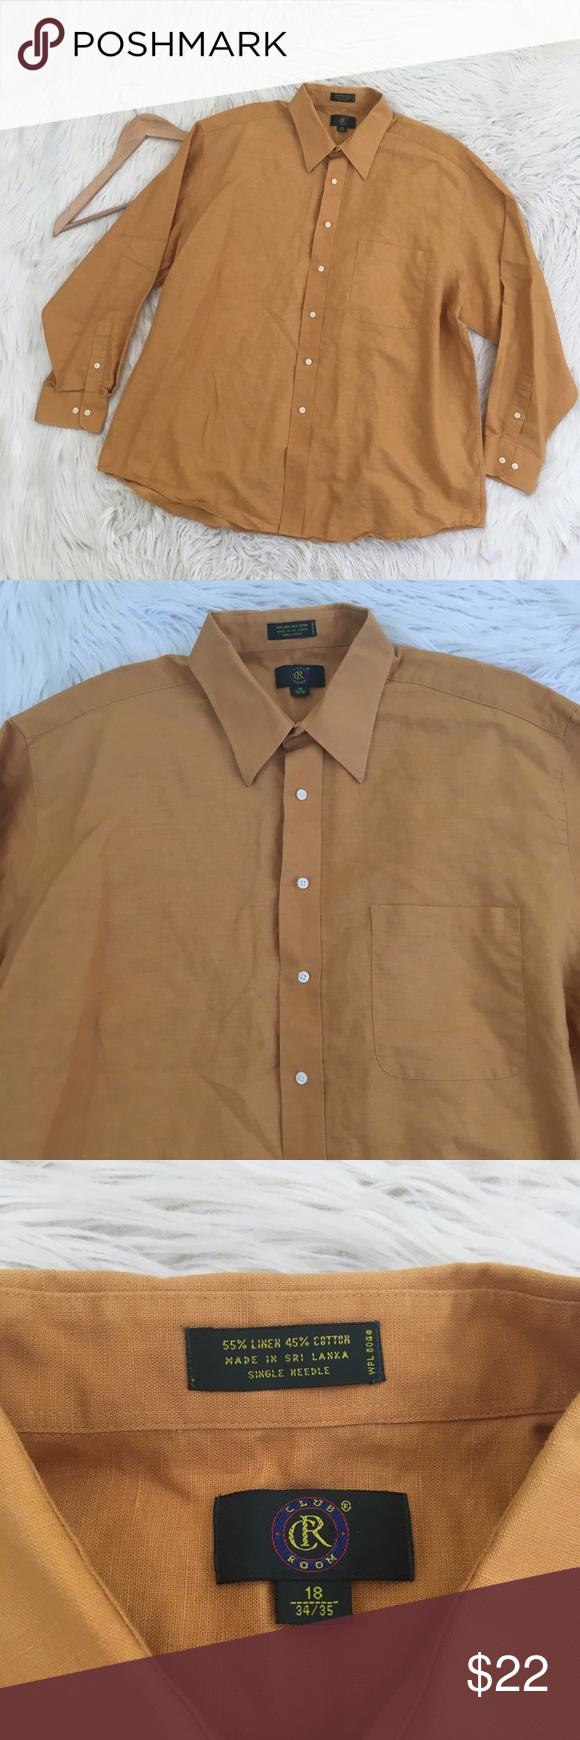 Yellow dress shirt men  Club Room Mens Linen Blend Yellow Dress Shirt  Pinterest  Yellow